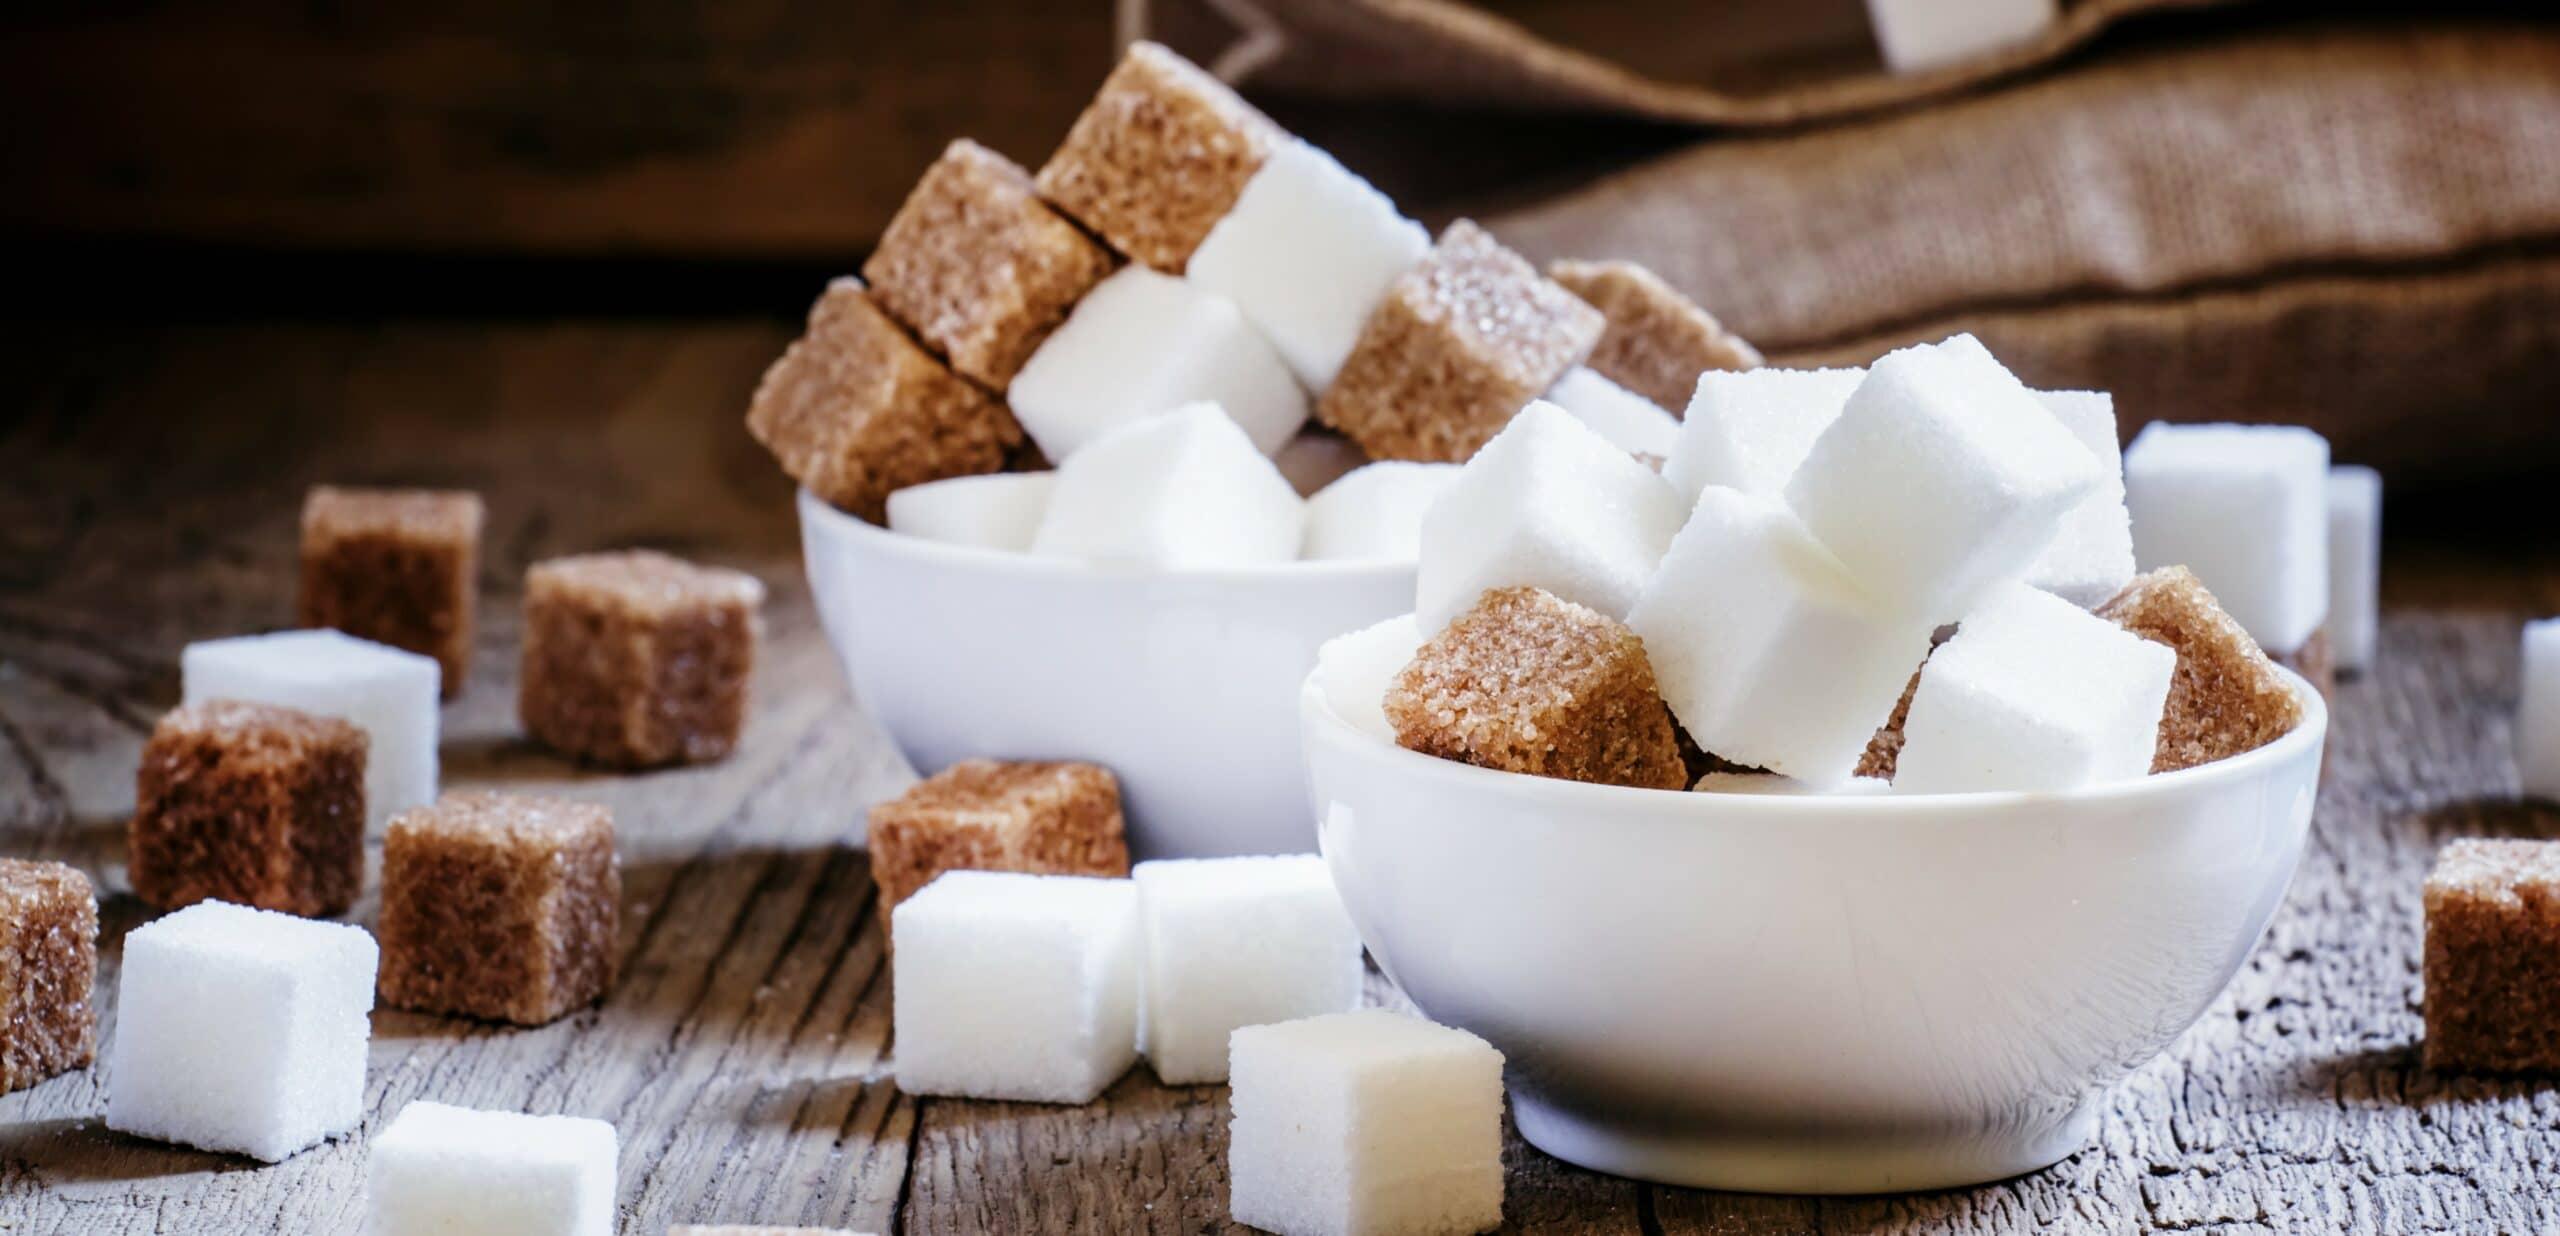 fruttosio o zucchero di canna